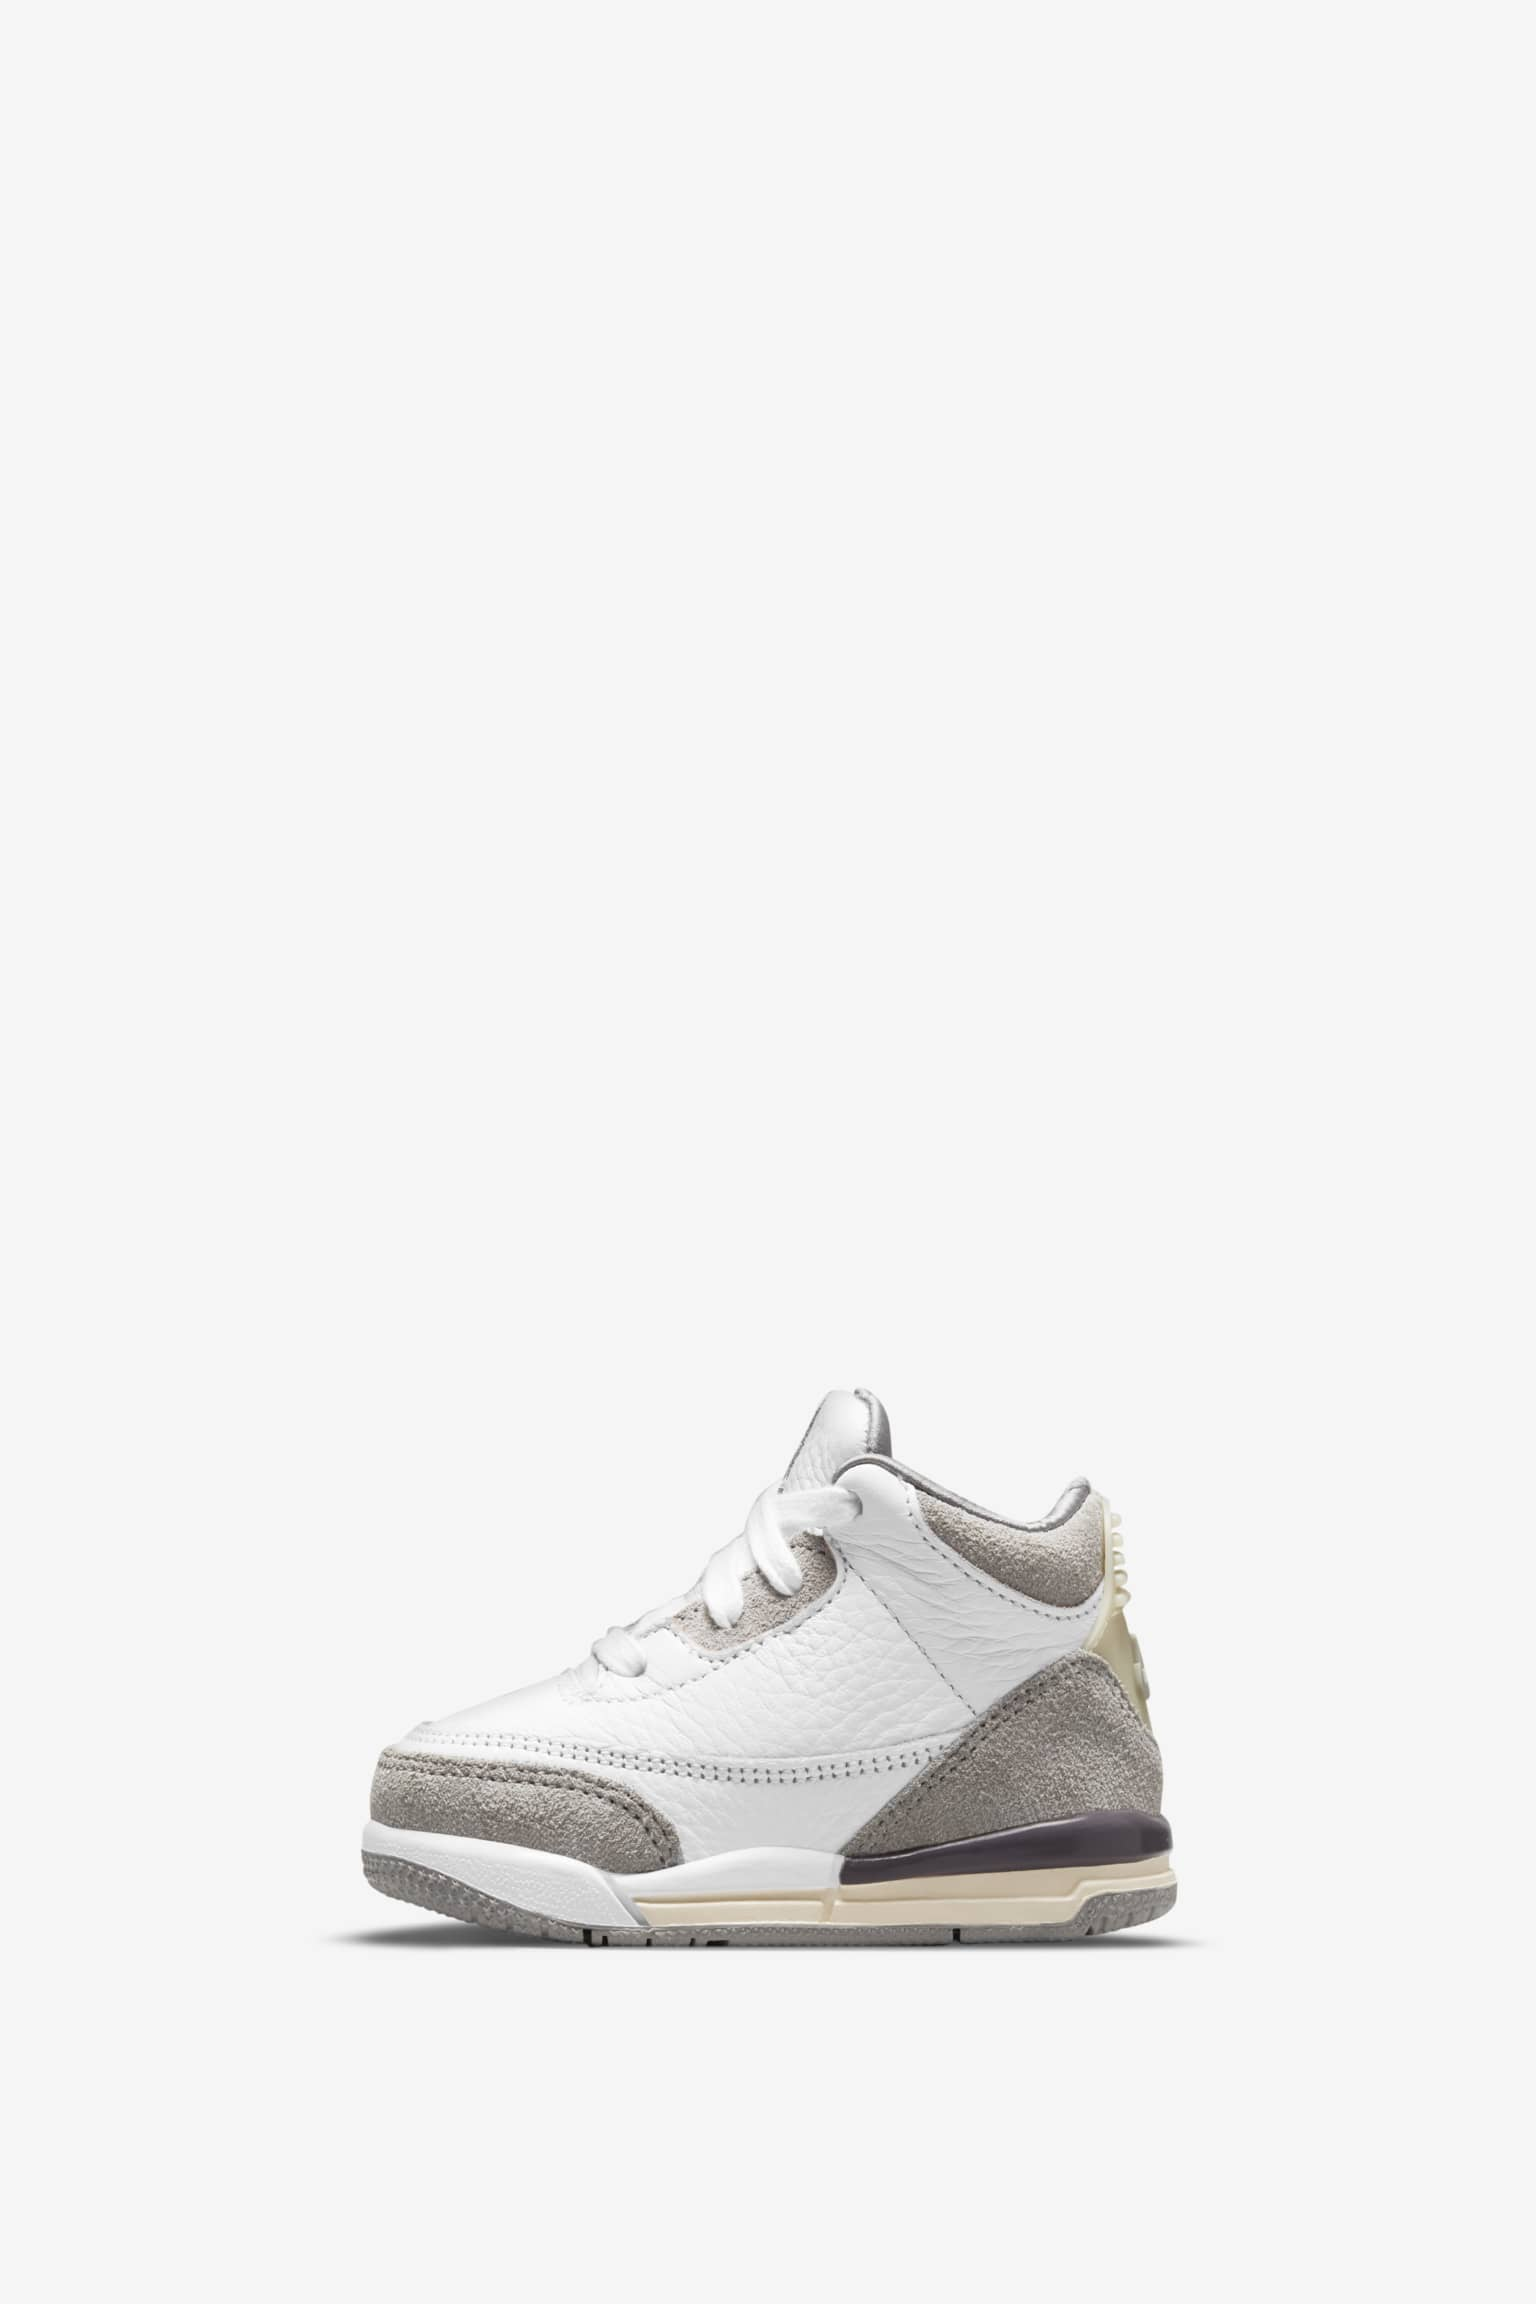 Women's Air Jordan 3 SP 'A Ma Maniére' Release Date. Nike SNKRS